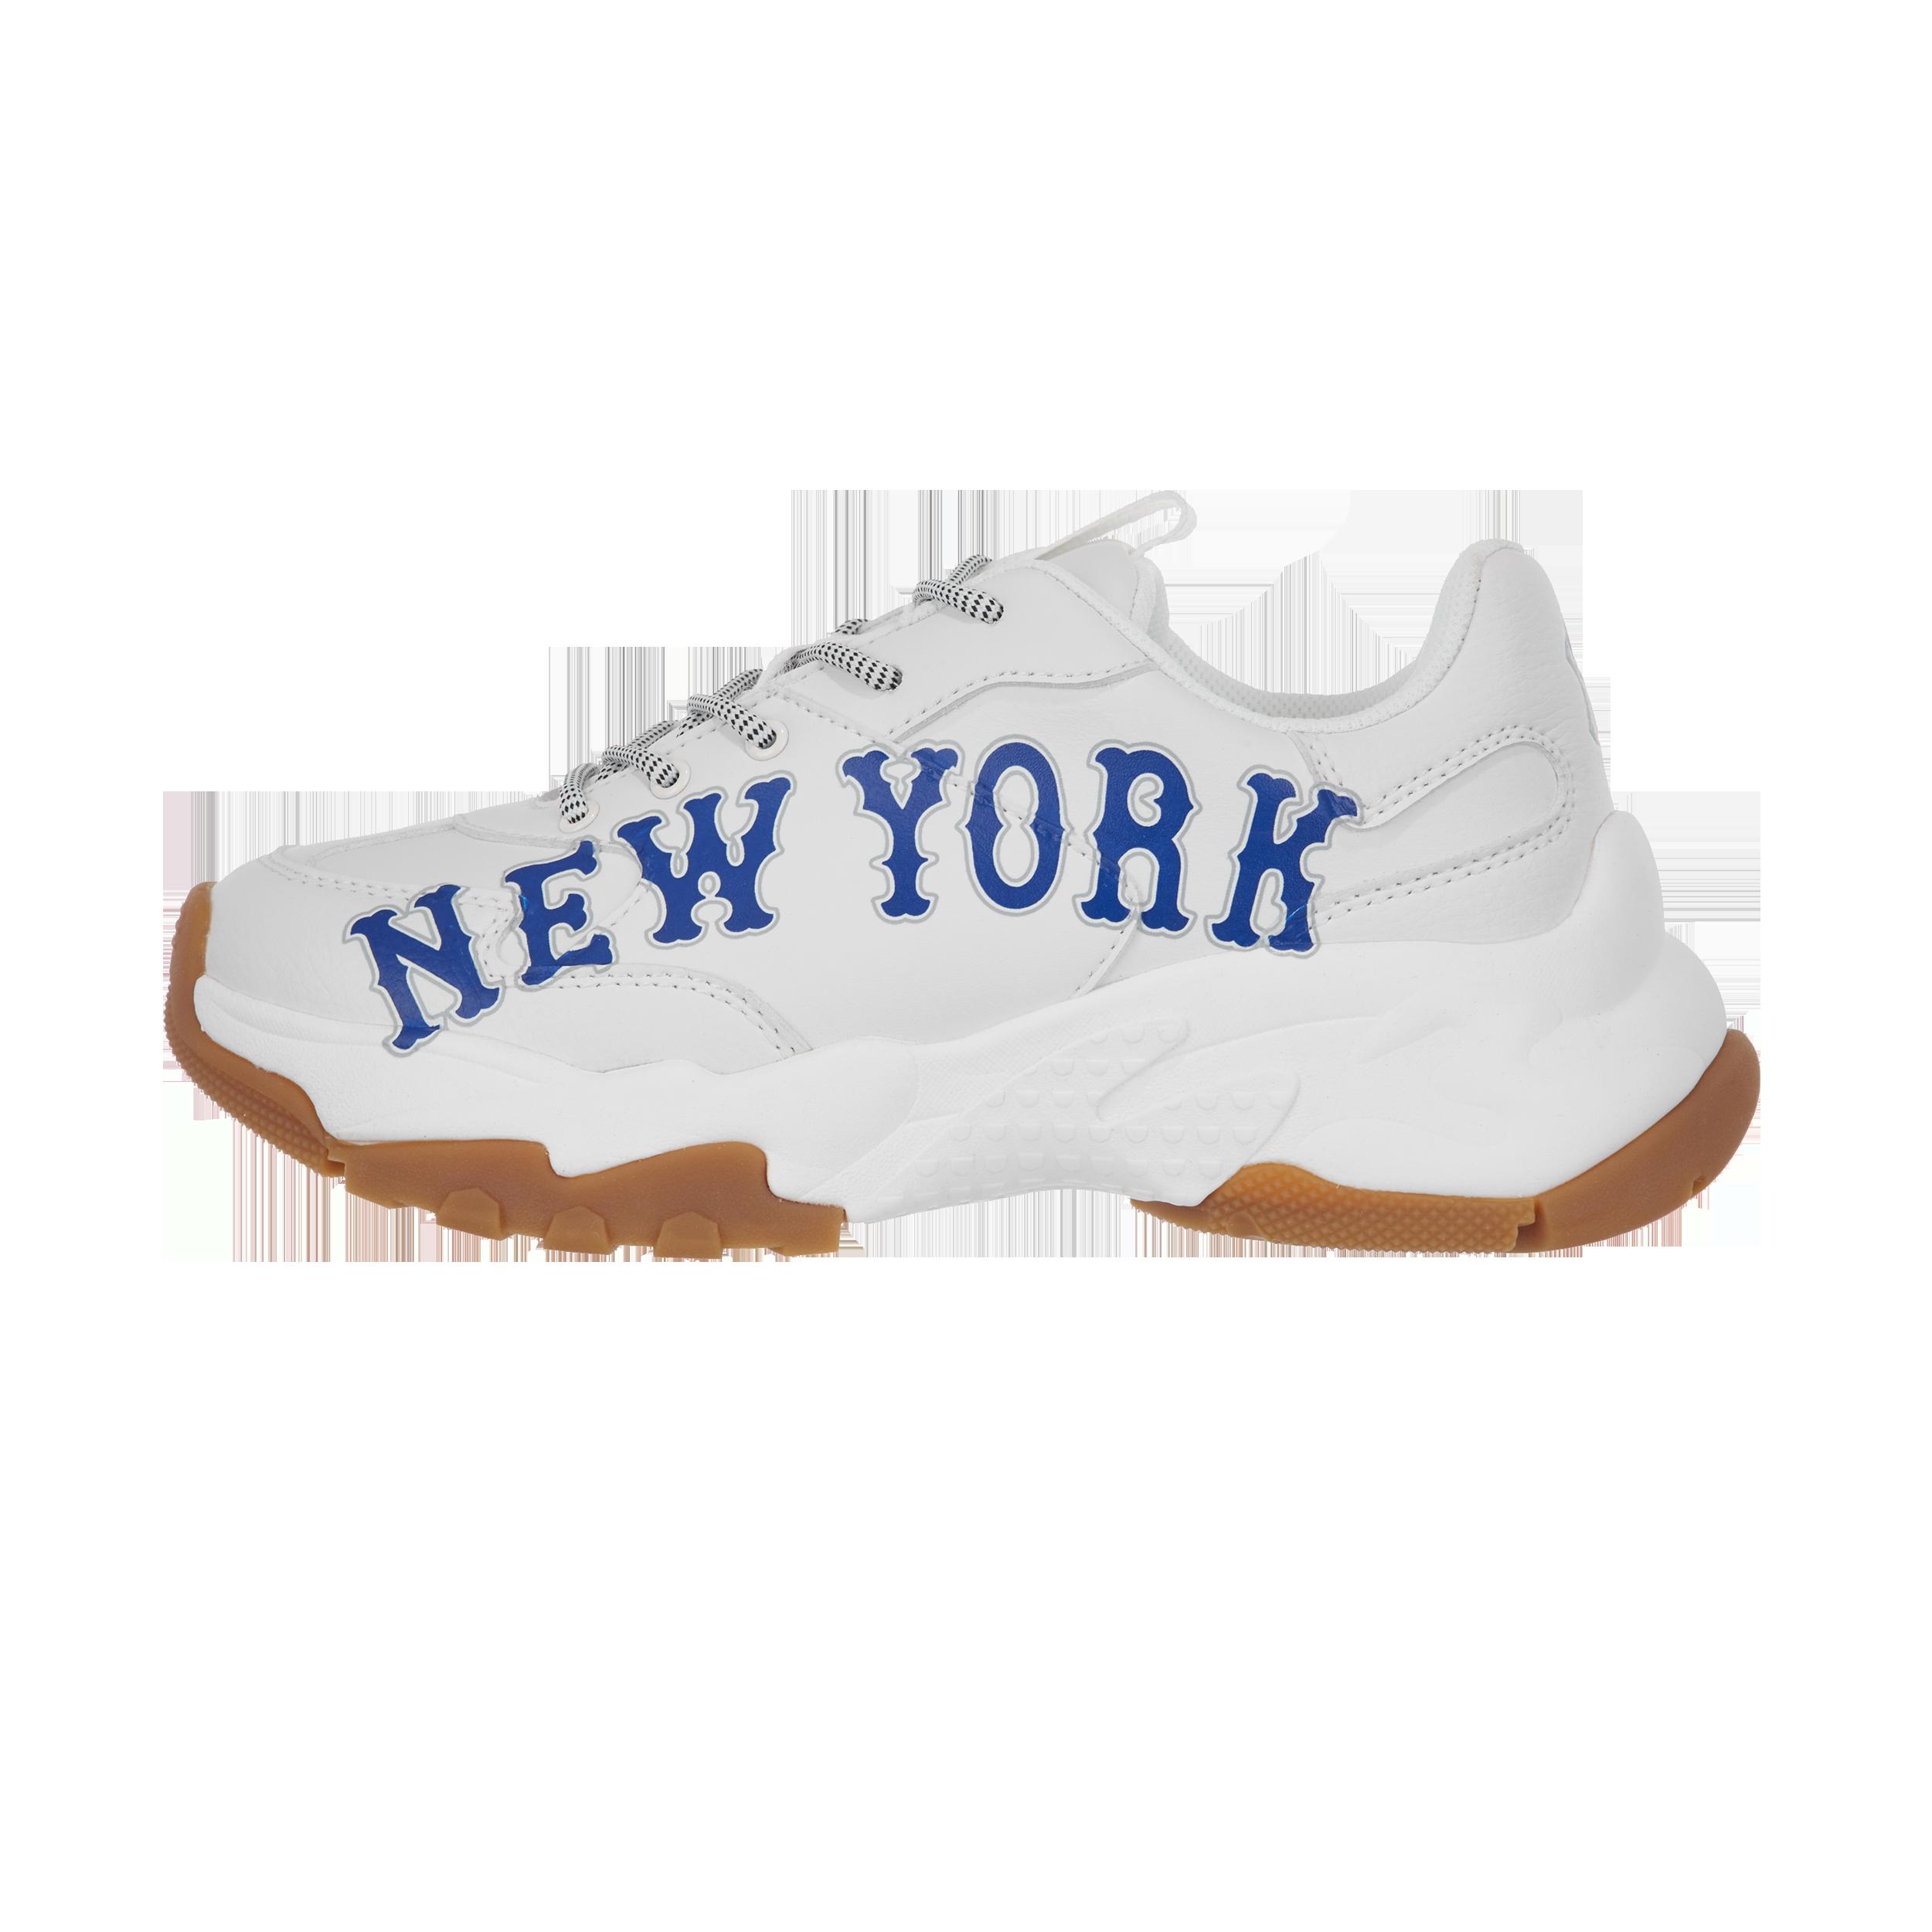 NEW YORK YANKEES SNEAKERS - BIG BALL CHUNKY P